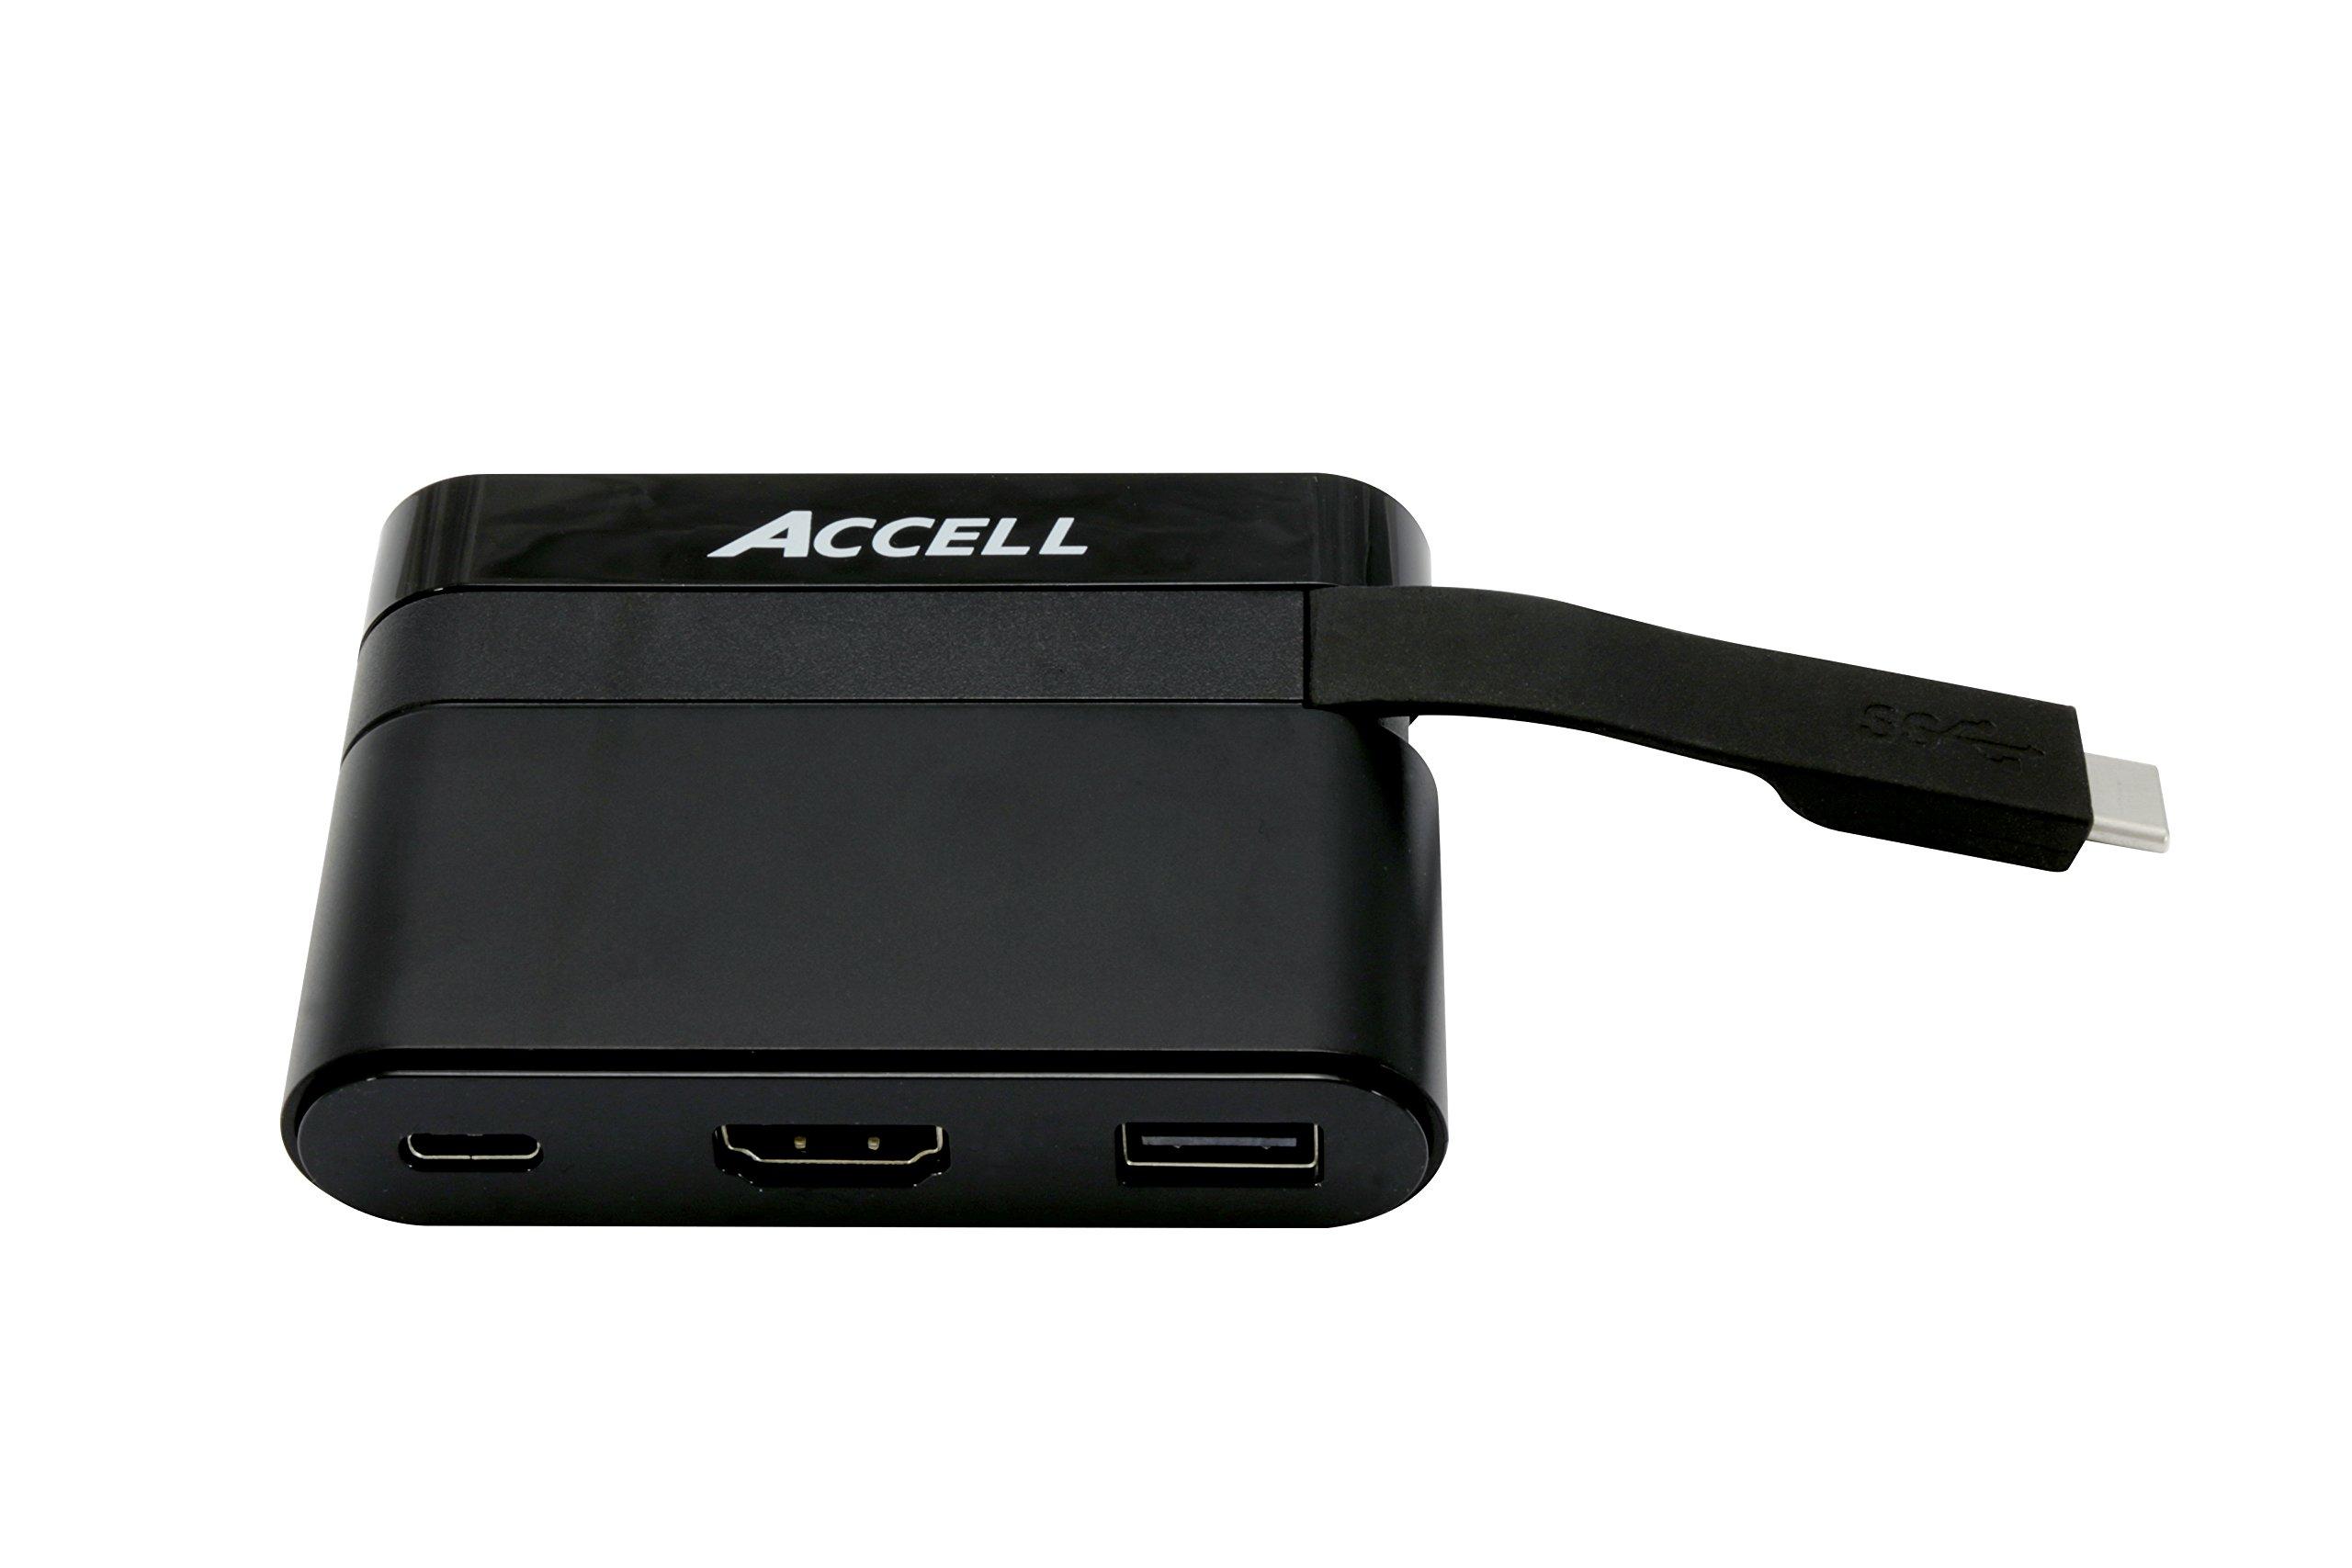 Accell U206B-001B USB-C Portable Dock - HDMI 2.0 (4K UHD @ 60Hz), USB-A 2.0, USB- C Charging Port 3Amp - Compatible with Thunderbolt 3, MacBook Pro 2017, MacBook Retina, Chromebook Pixel 2015